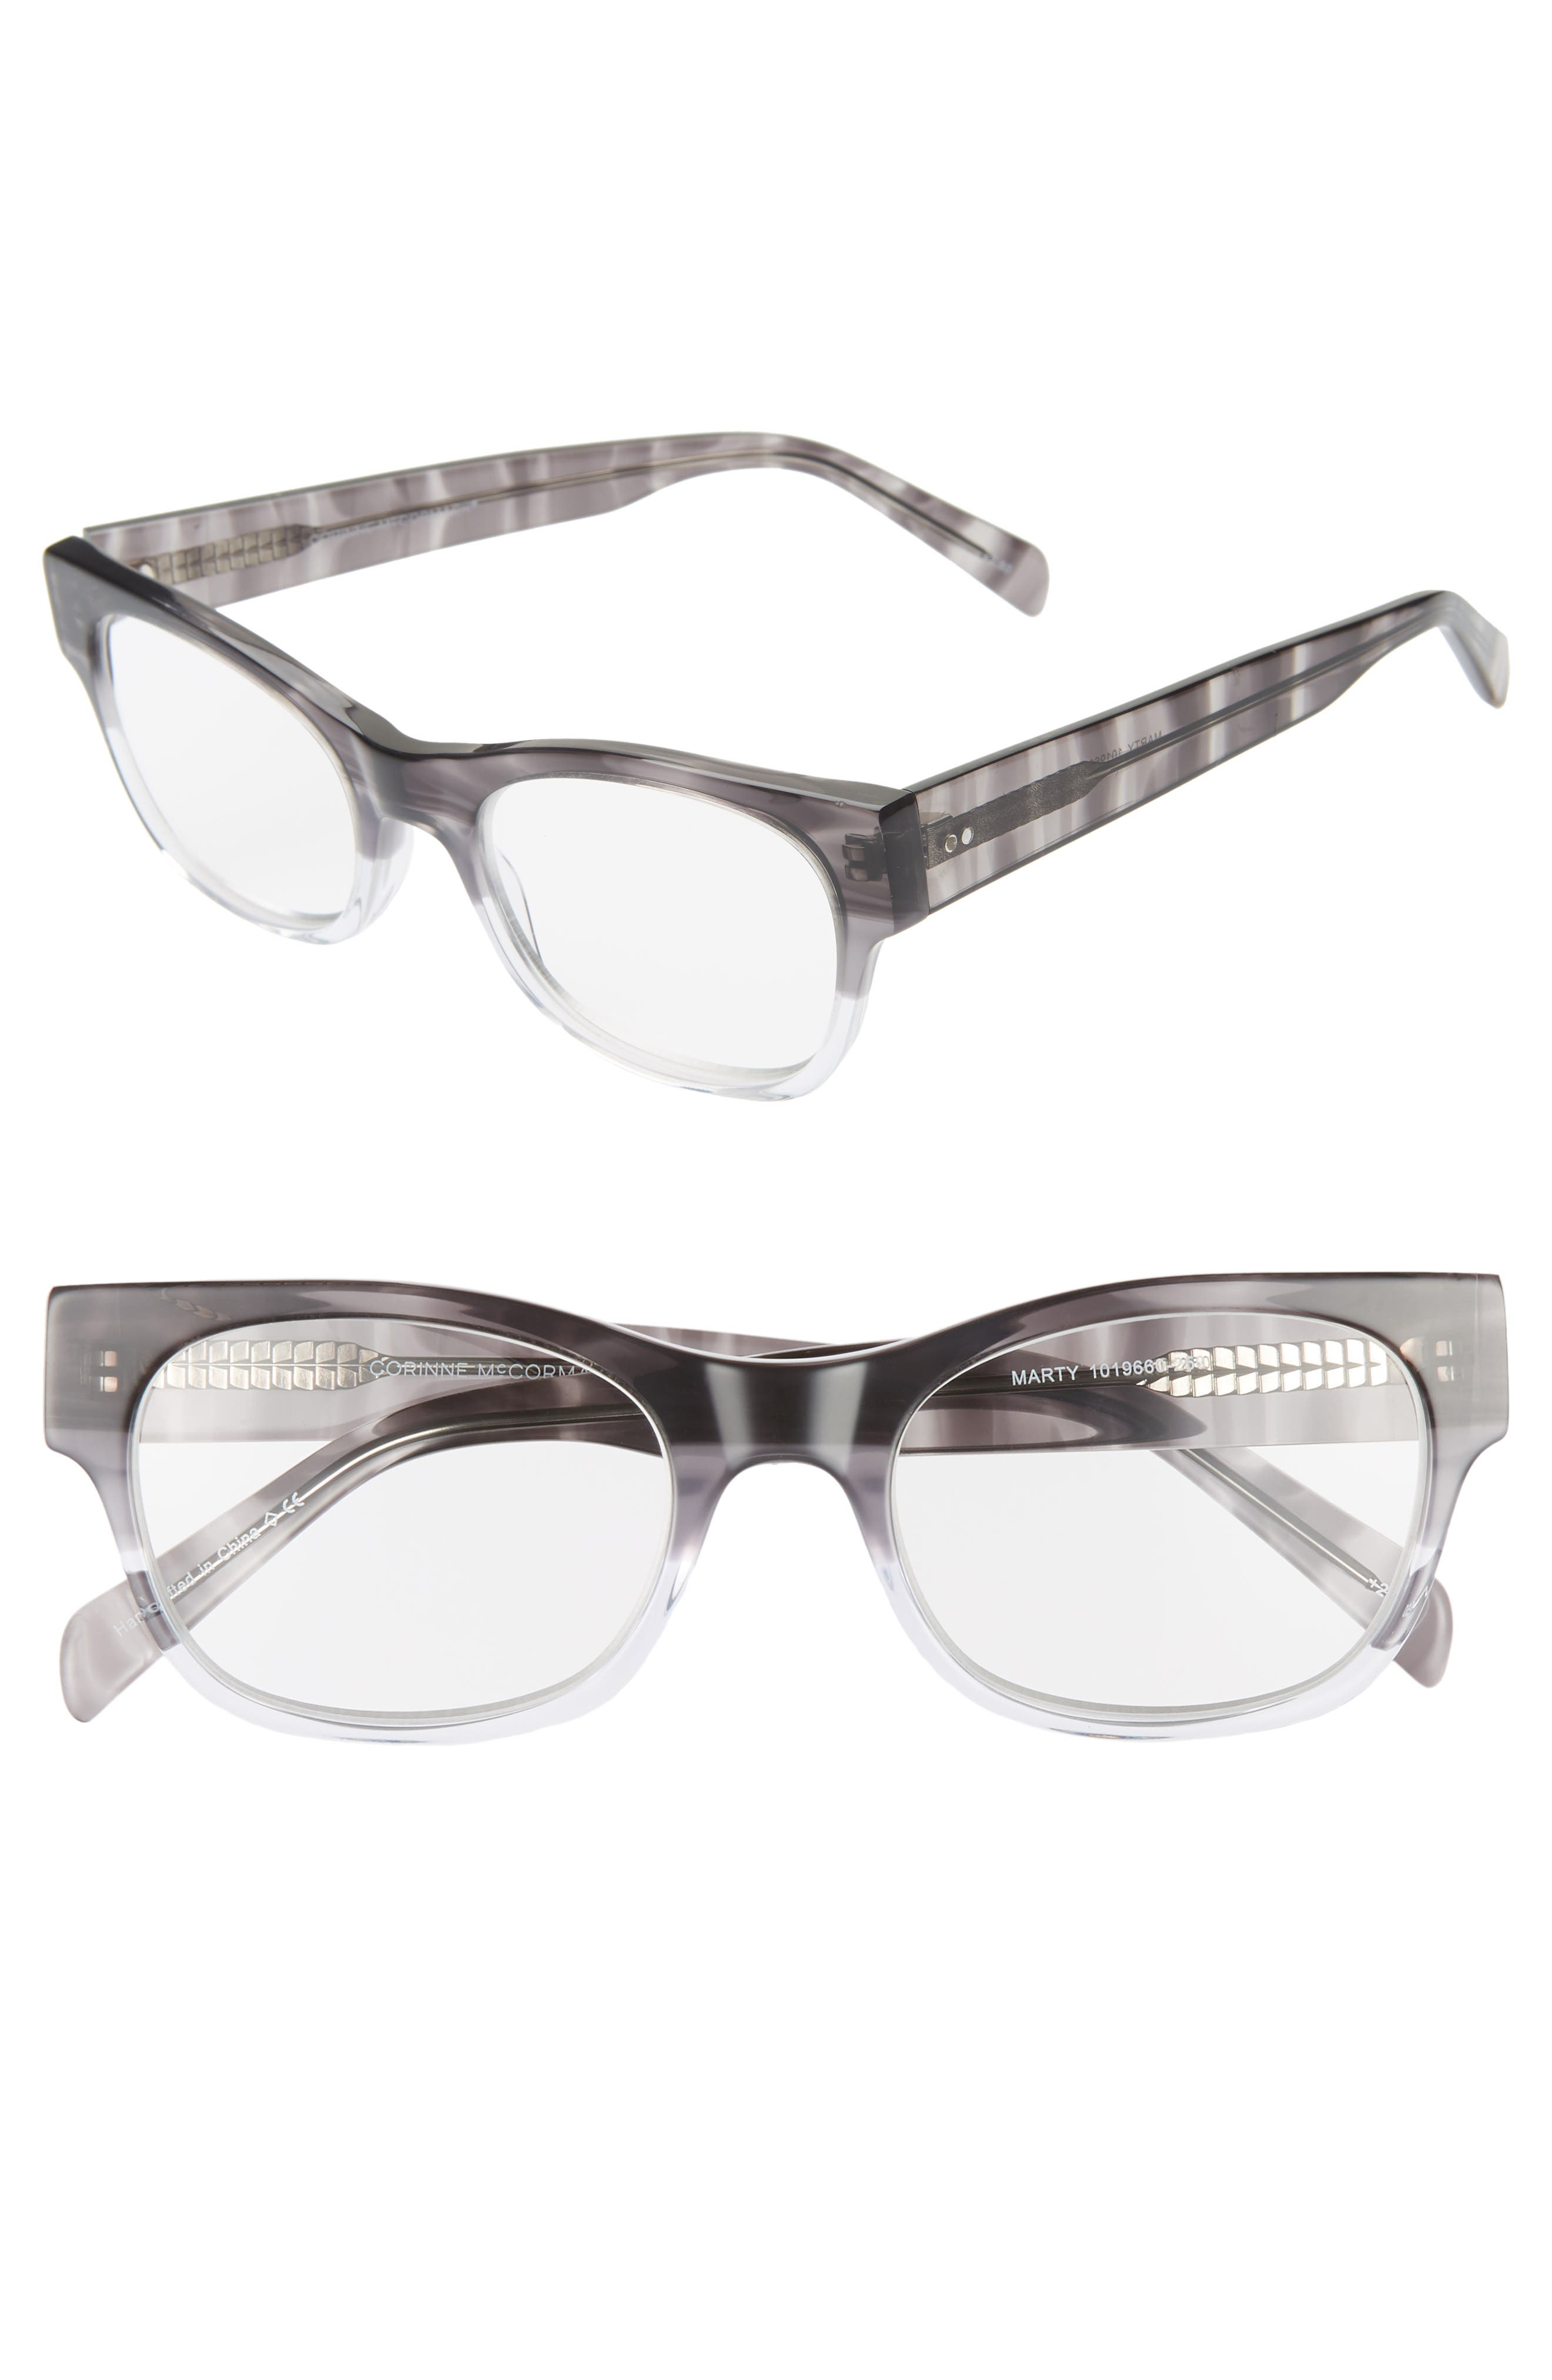 9e98a9efa410 corinne mccormack reading glasses